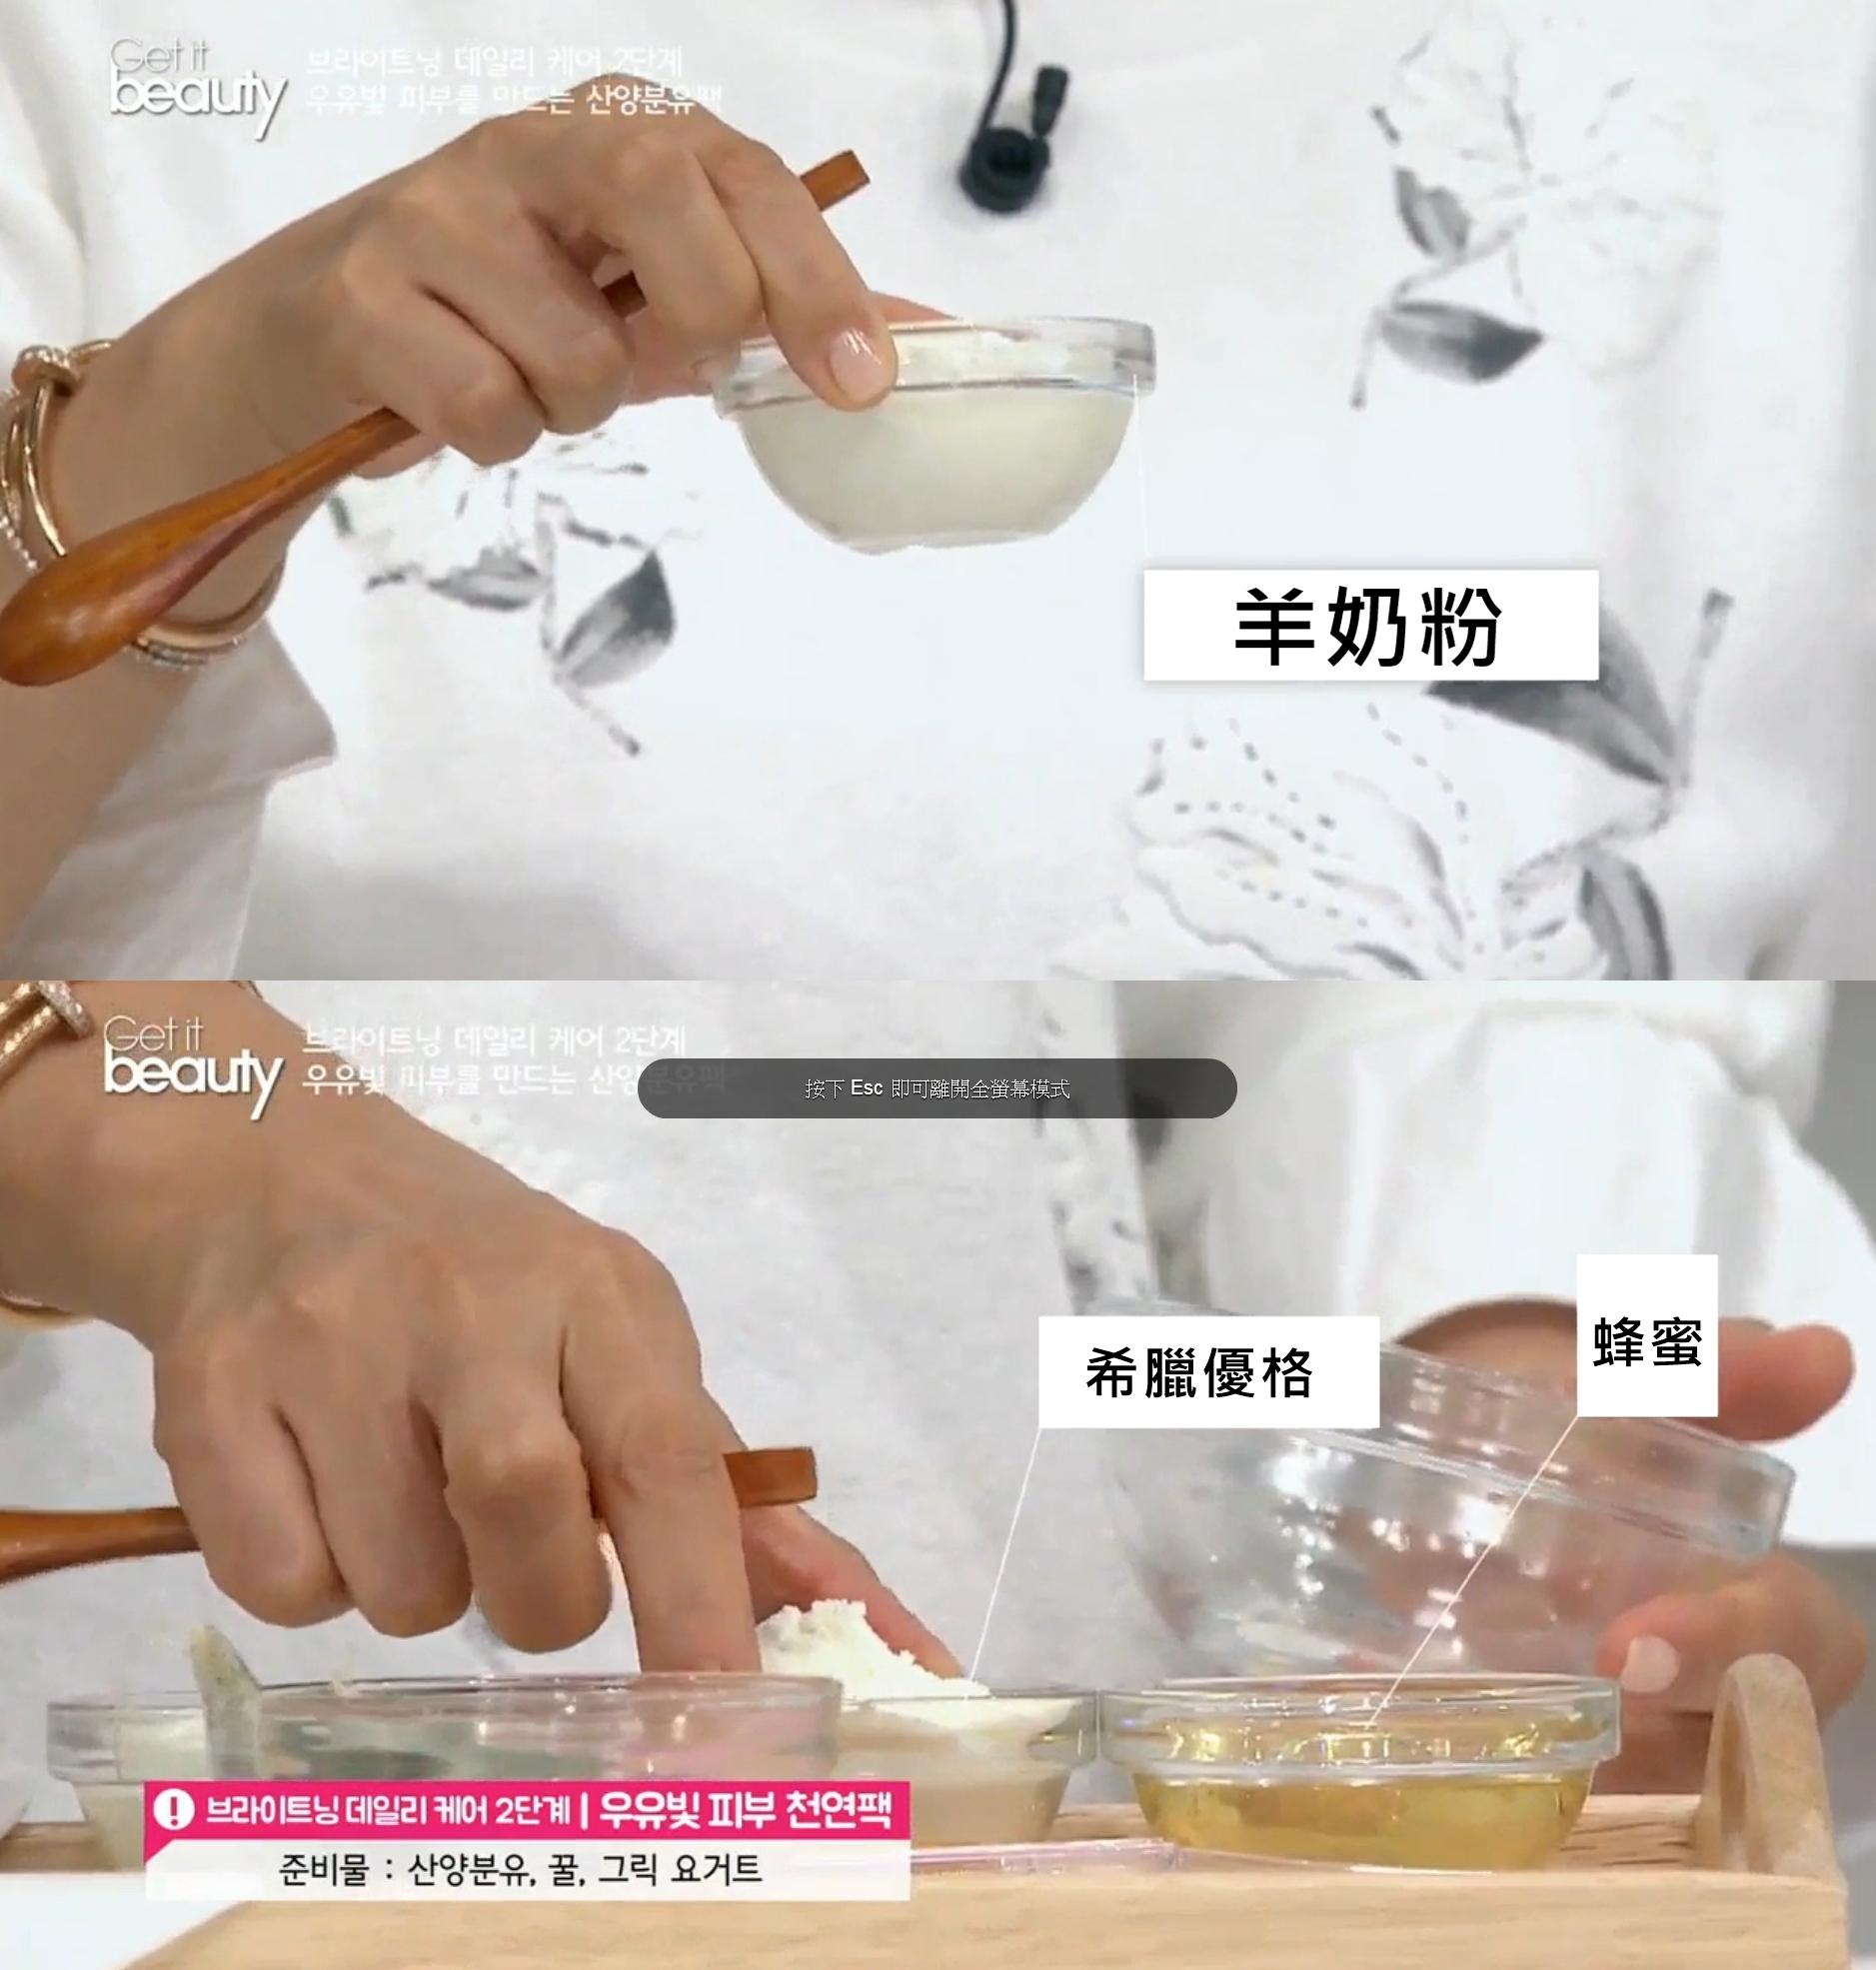 Step2  接著更神奇的東西出現了!老師要教大家自製有提亮效果的有機面膜。材料有羊奶粉+蜂蜜+希臘優格,以1:1:1的比例調配。